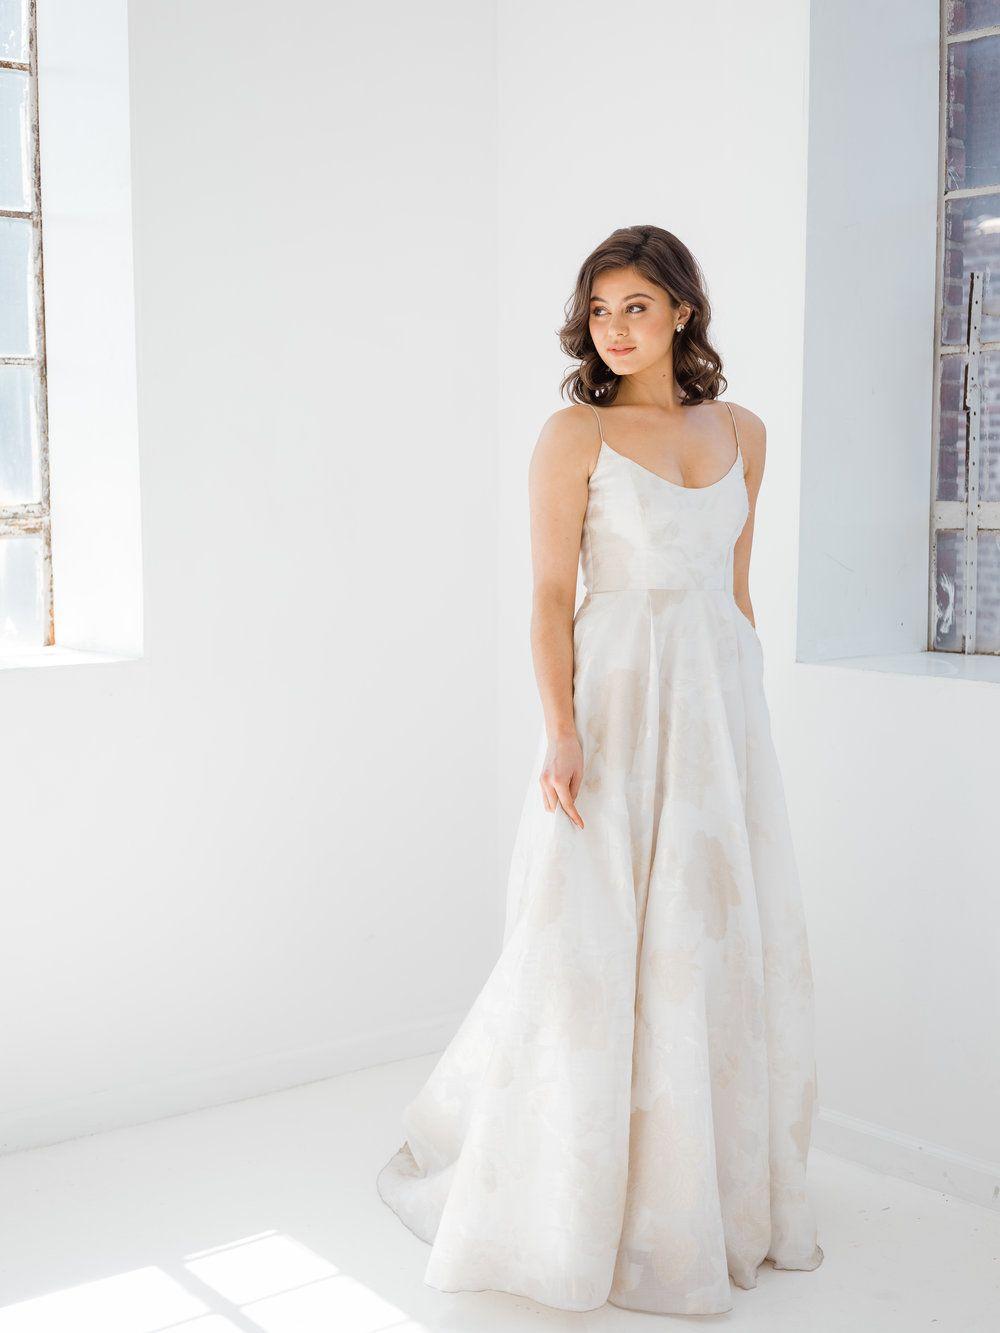 Wspco 05012018 Rebecca Schoneveld Part Two 25 Jpg Rebecca Schoneveld Timeless Wedding Dress Beautiful Wedding Gowns [ 1333 x 1000 Pixel ]